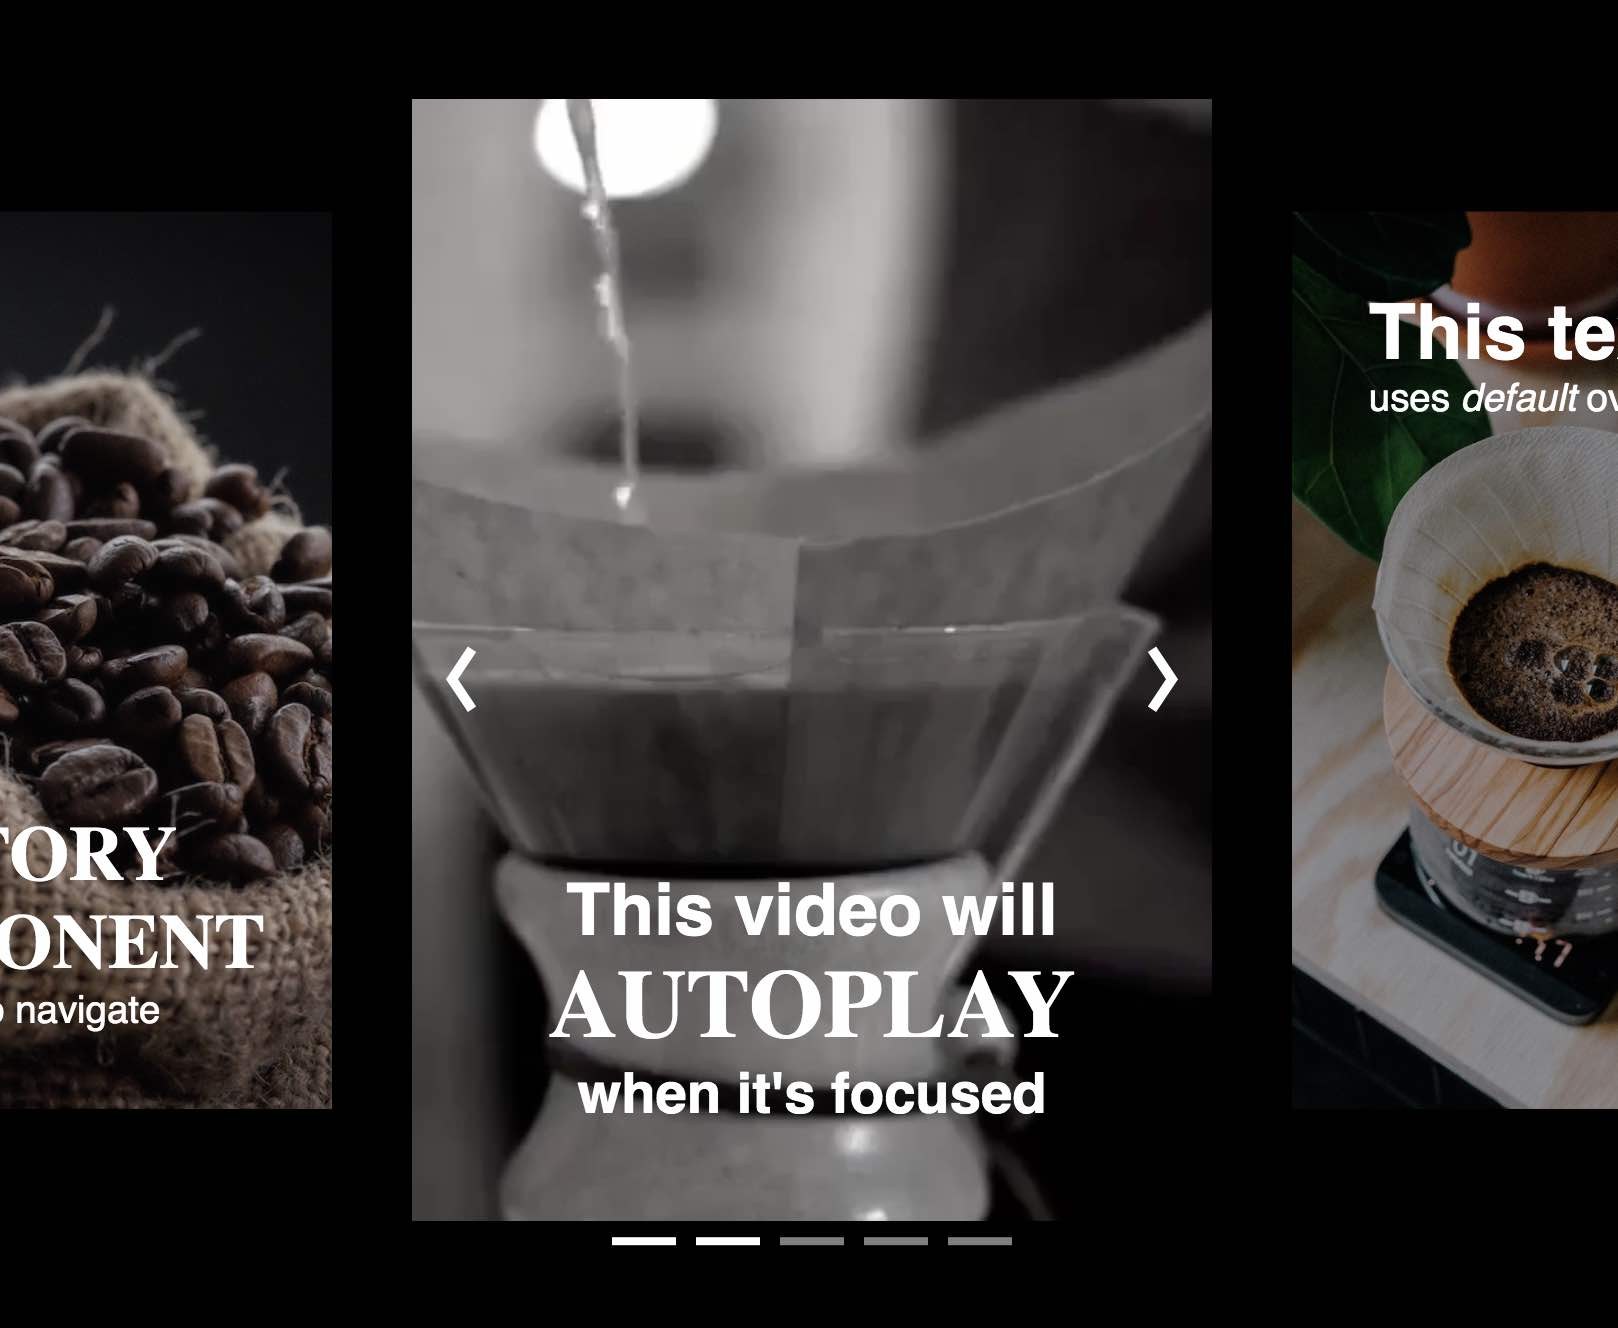 Komponen penampil story lengkap yang menampilkan tiga gambar kopi